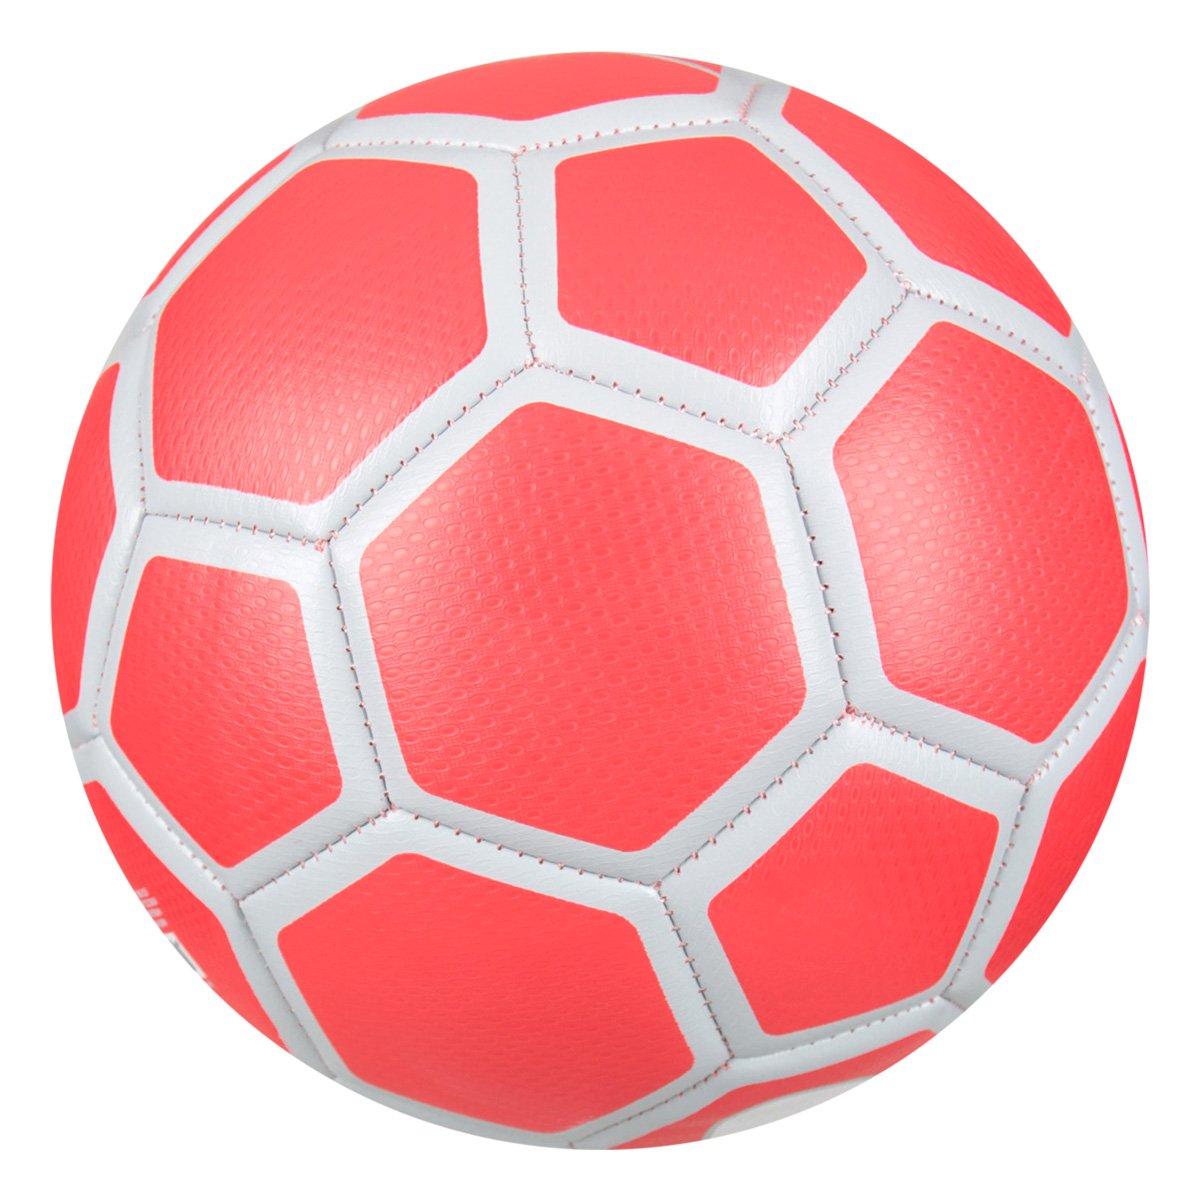 687bca82ea Bola Futsal Nike FootballX Menor - Cinza e Vermelho - Compre Agora ...